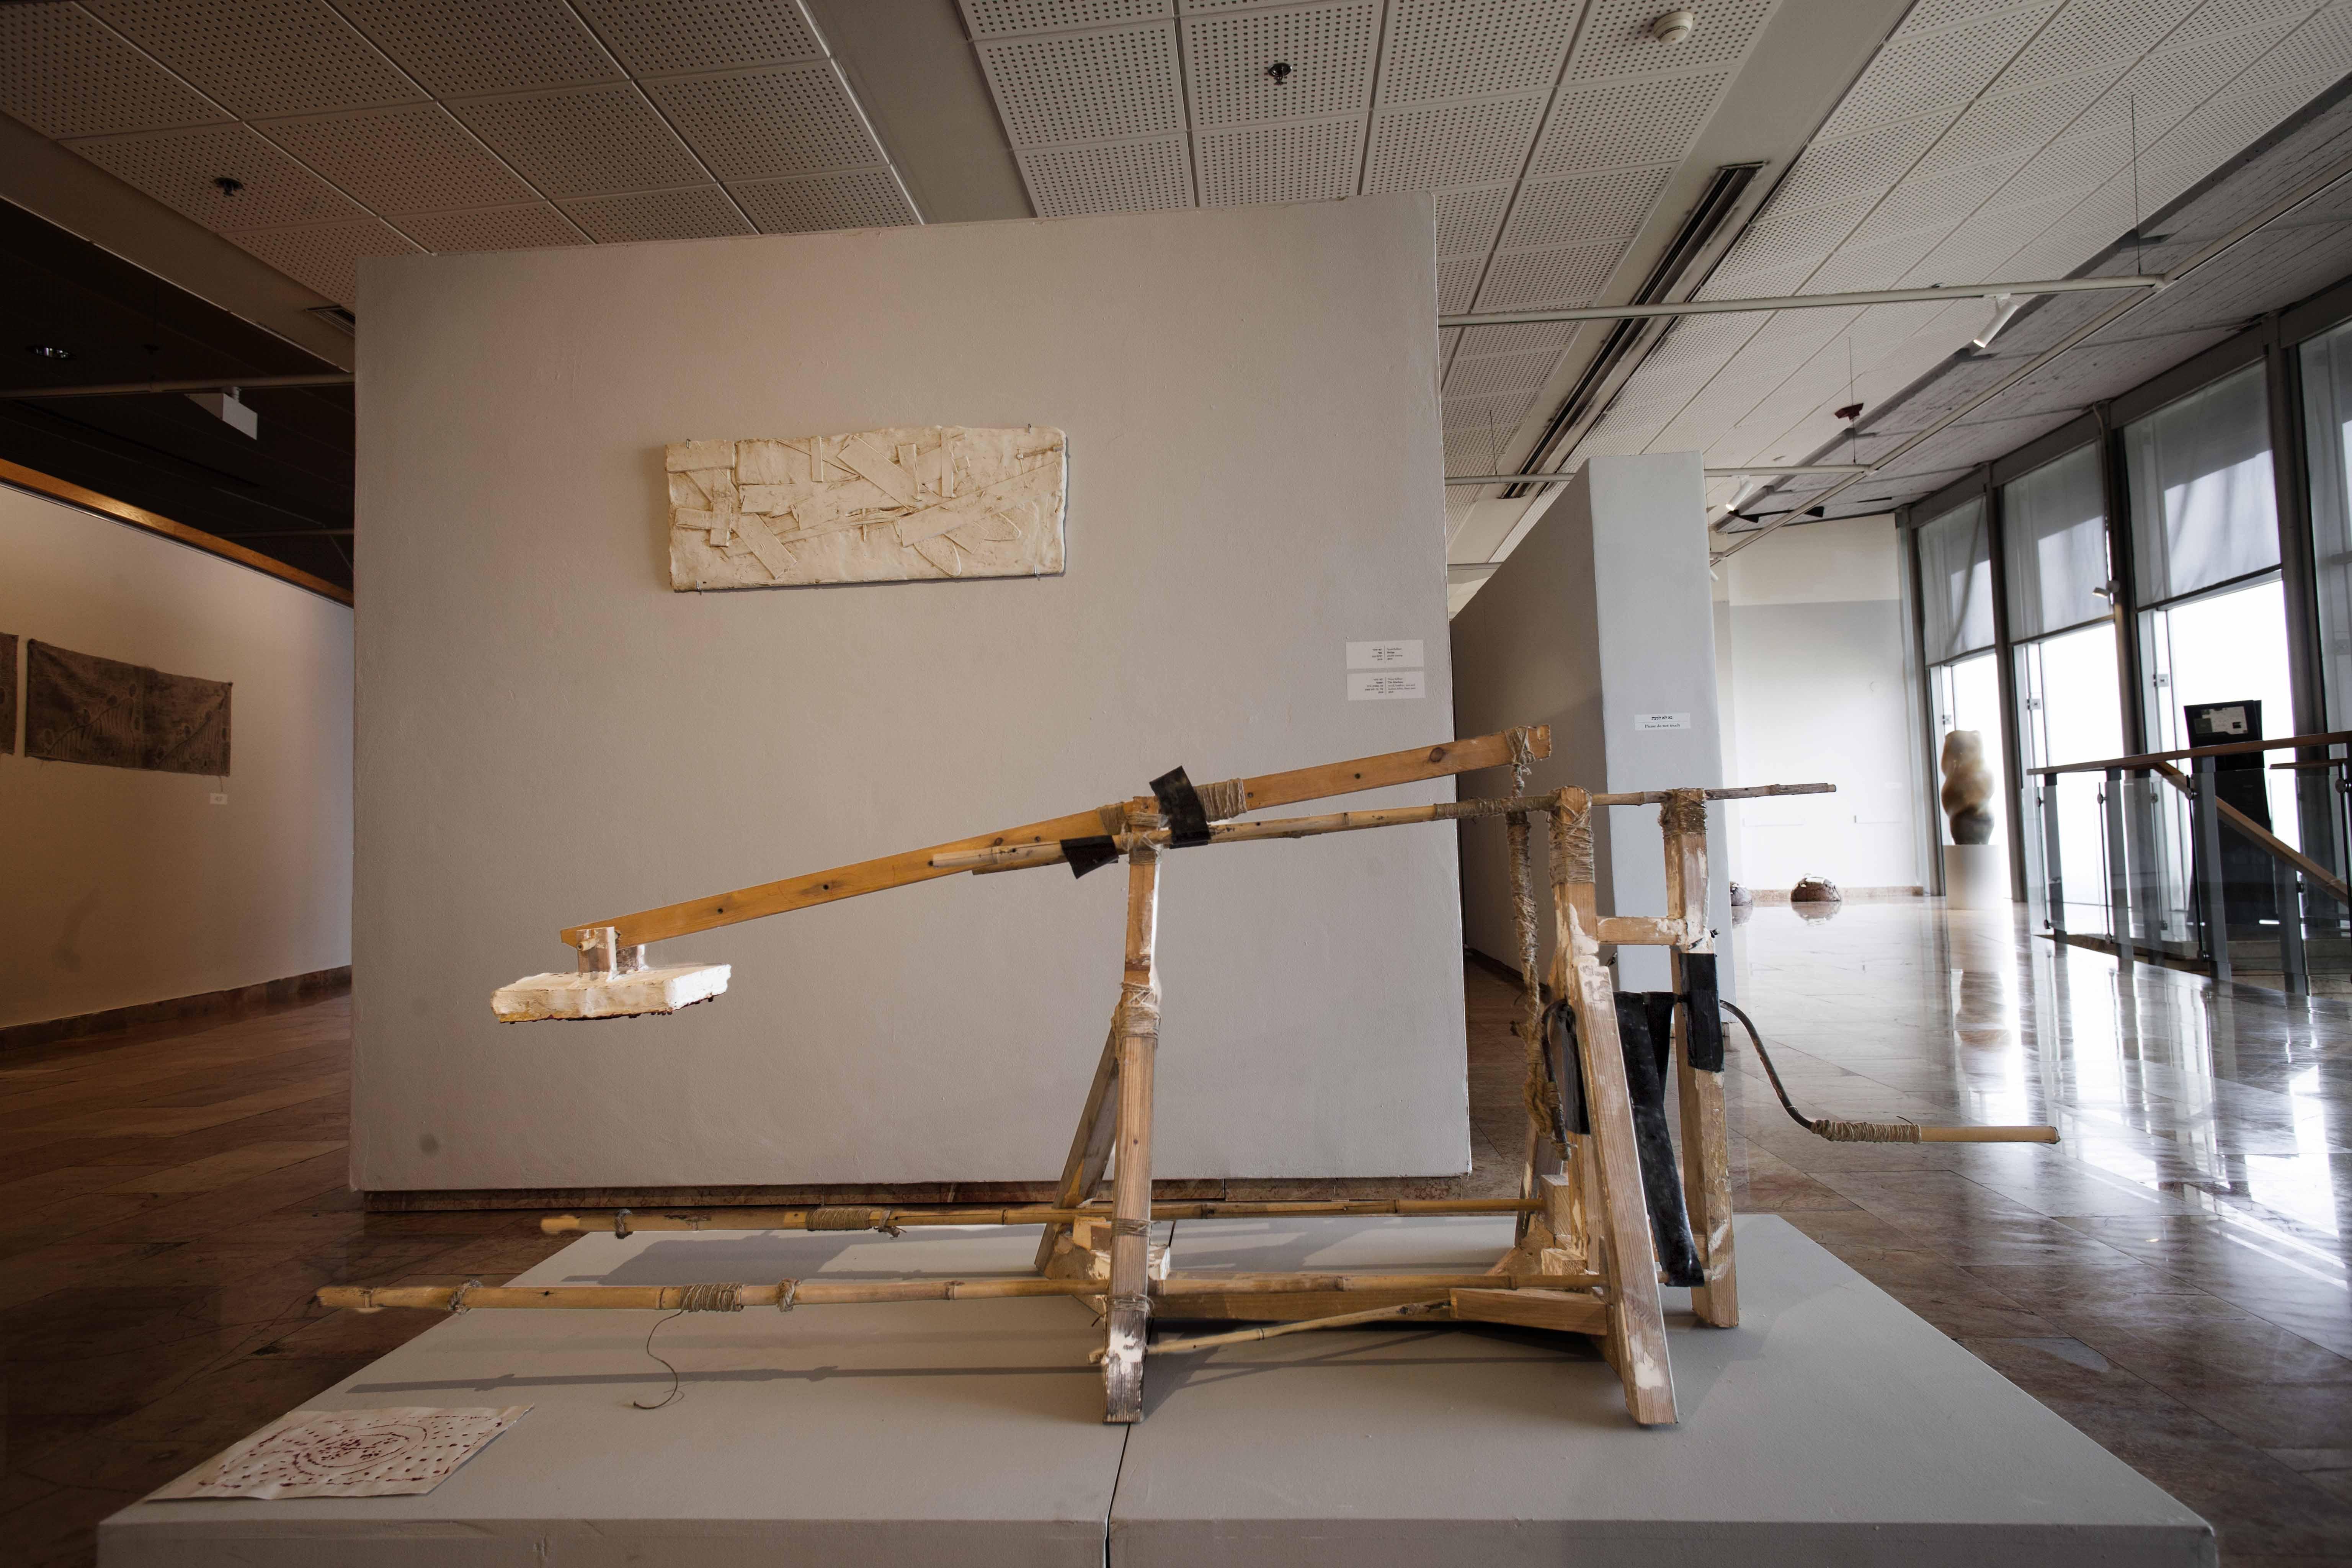 The machine, 2019, 190x80x70, Wood, bamb